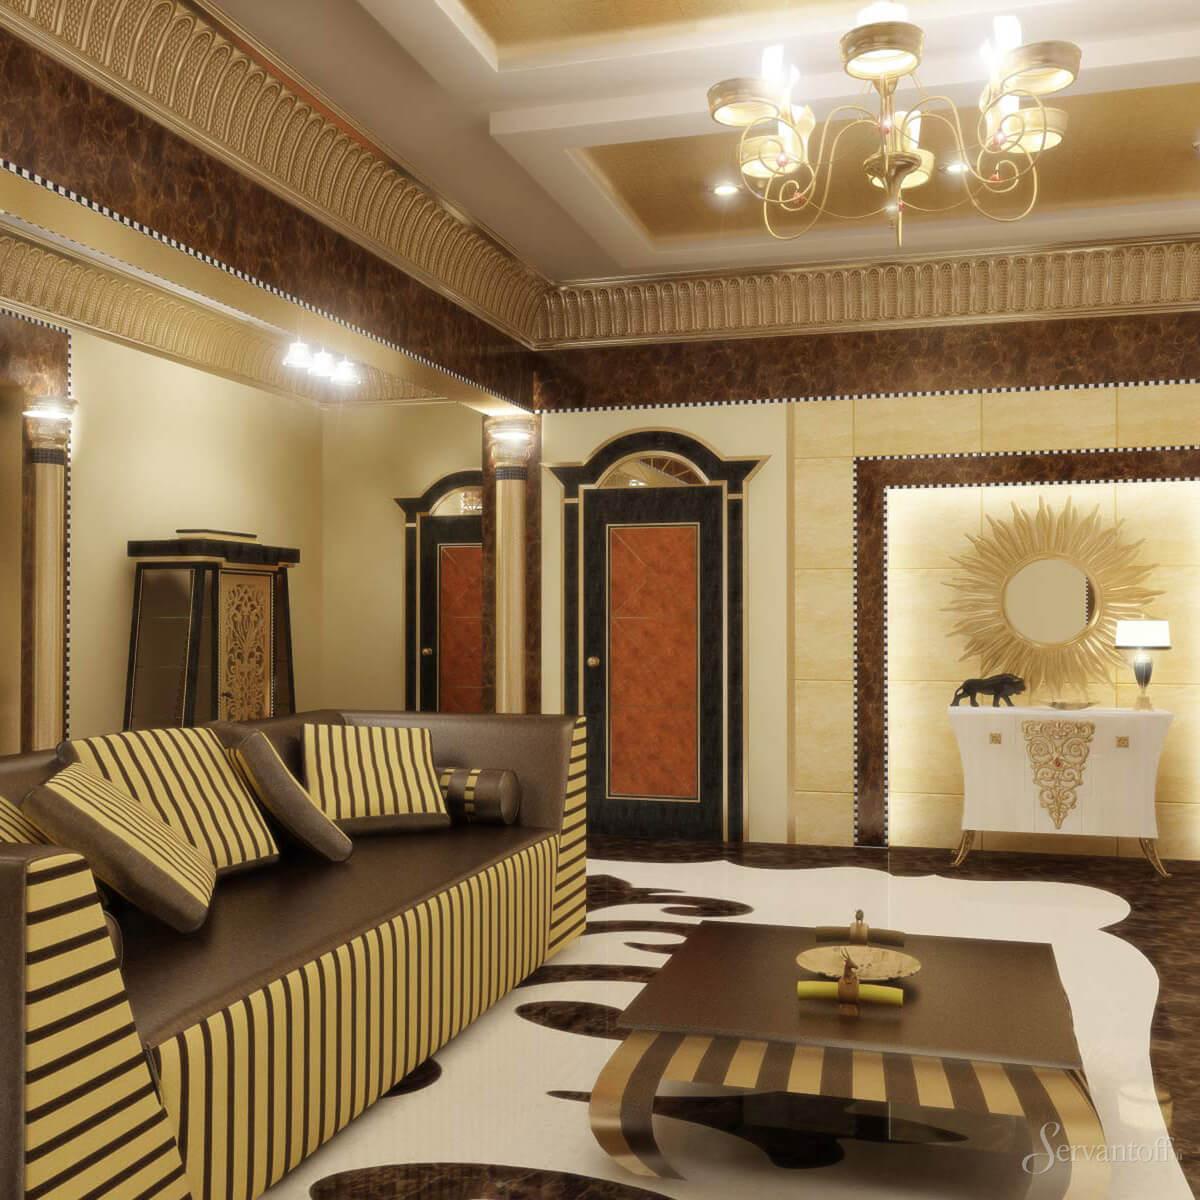 дизайнерские идеи интерьера: Египетский стиль в интерьере квартиры